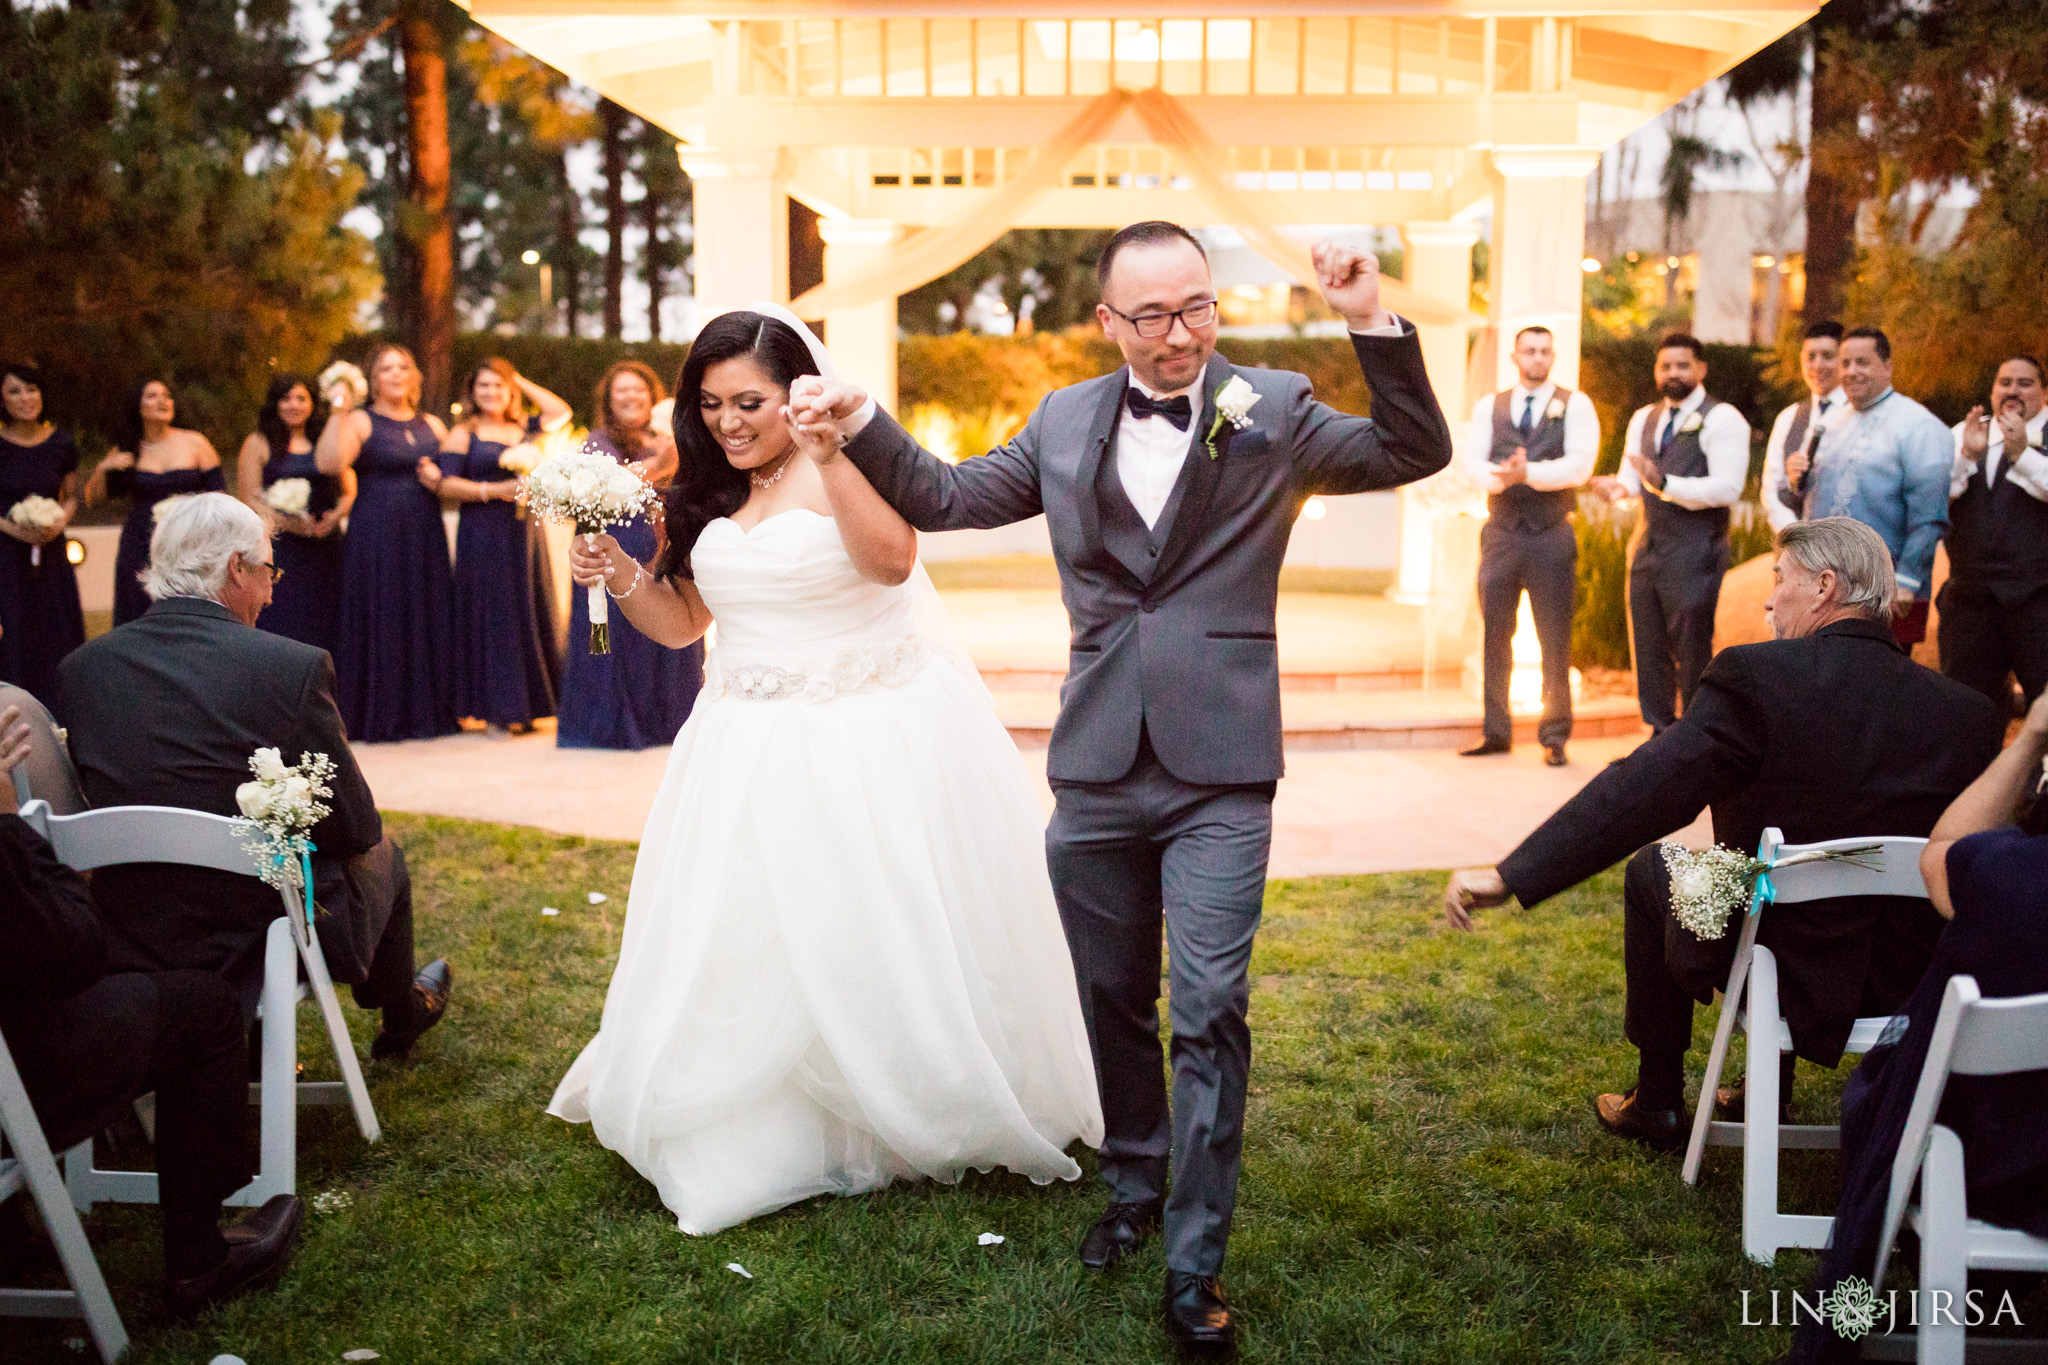 26 turnip rose promenade orange county wedding ceremony photography